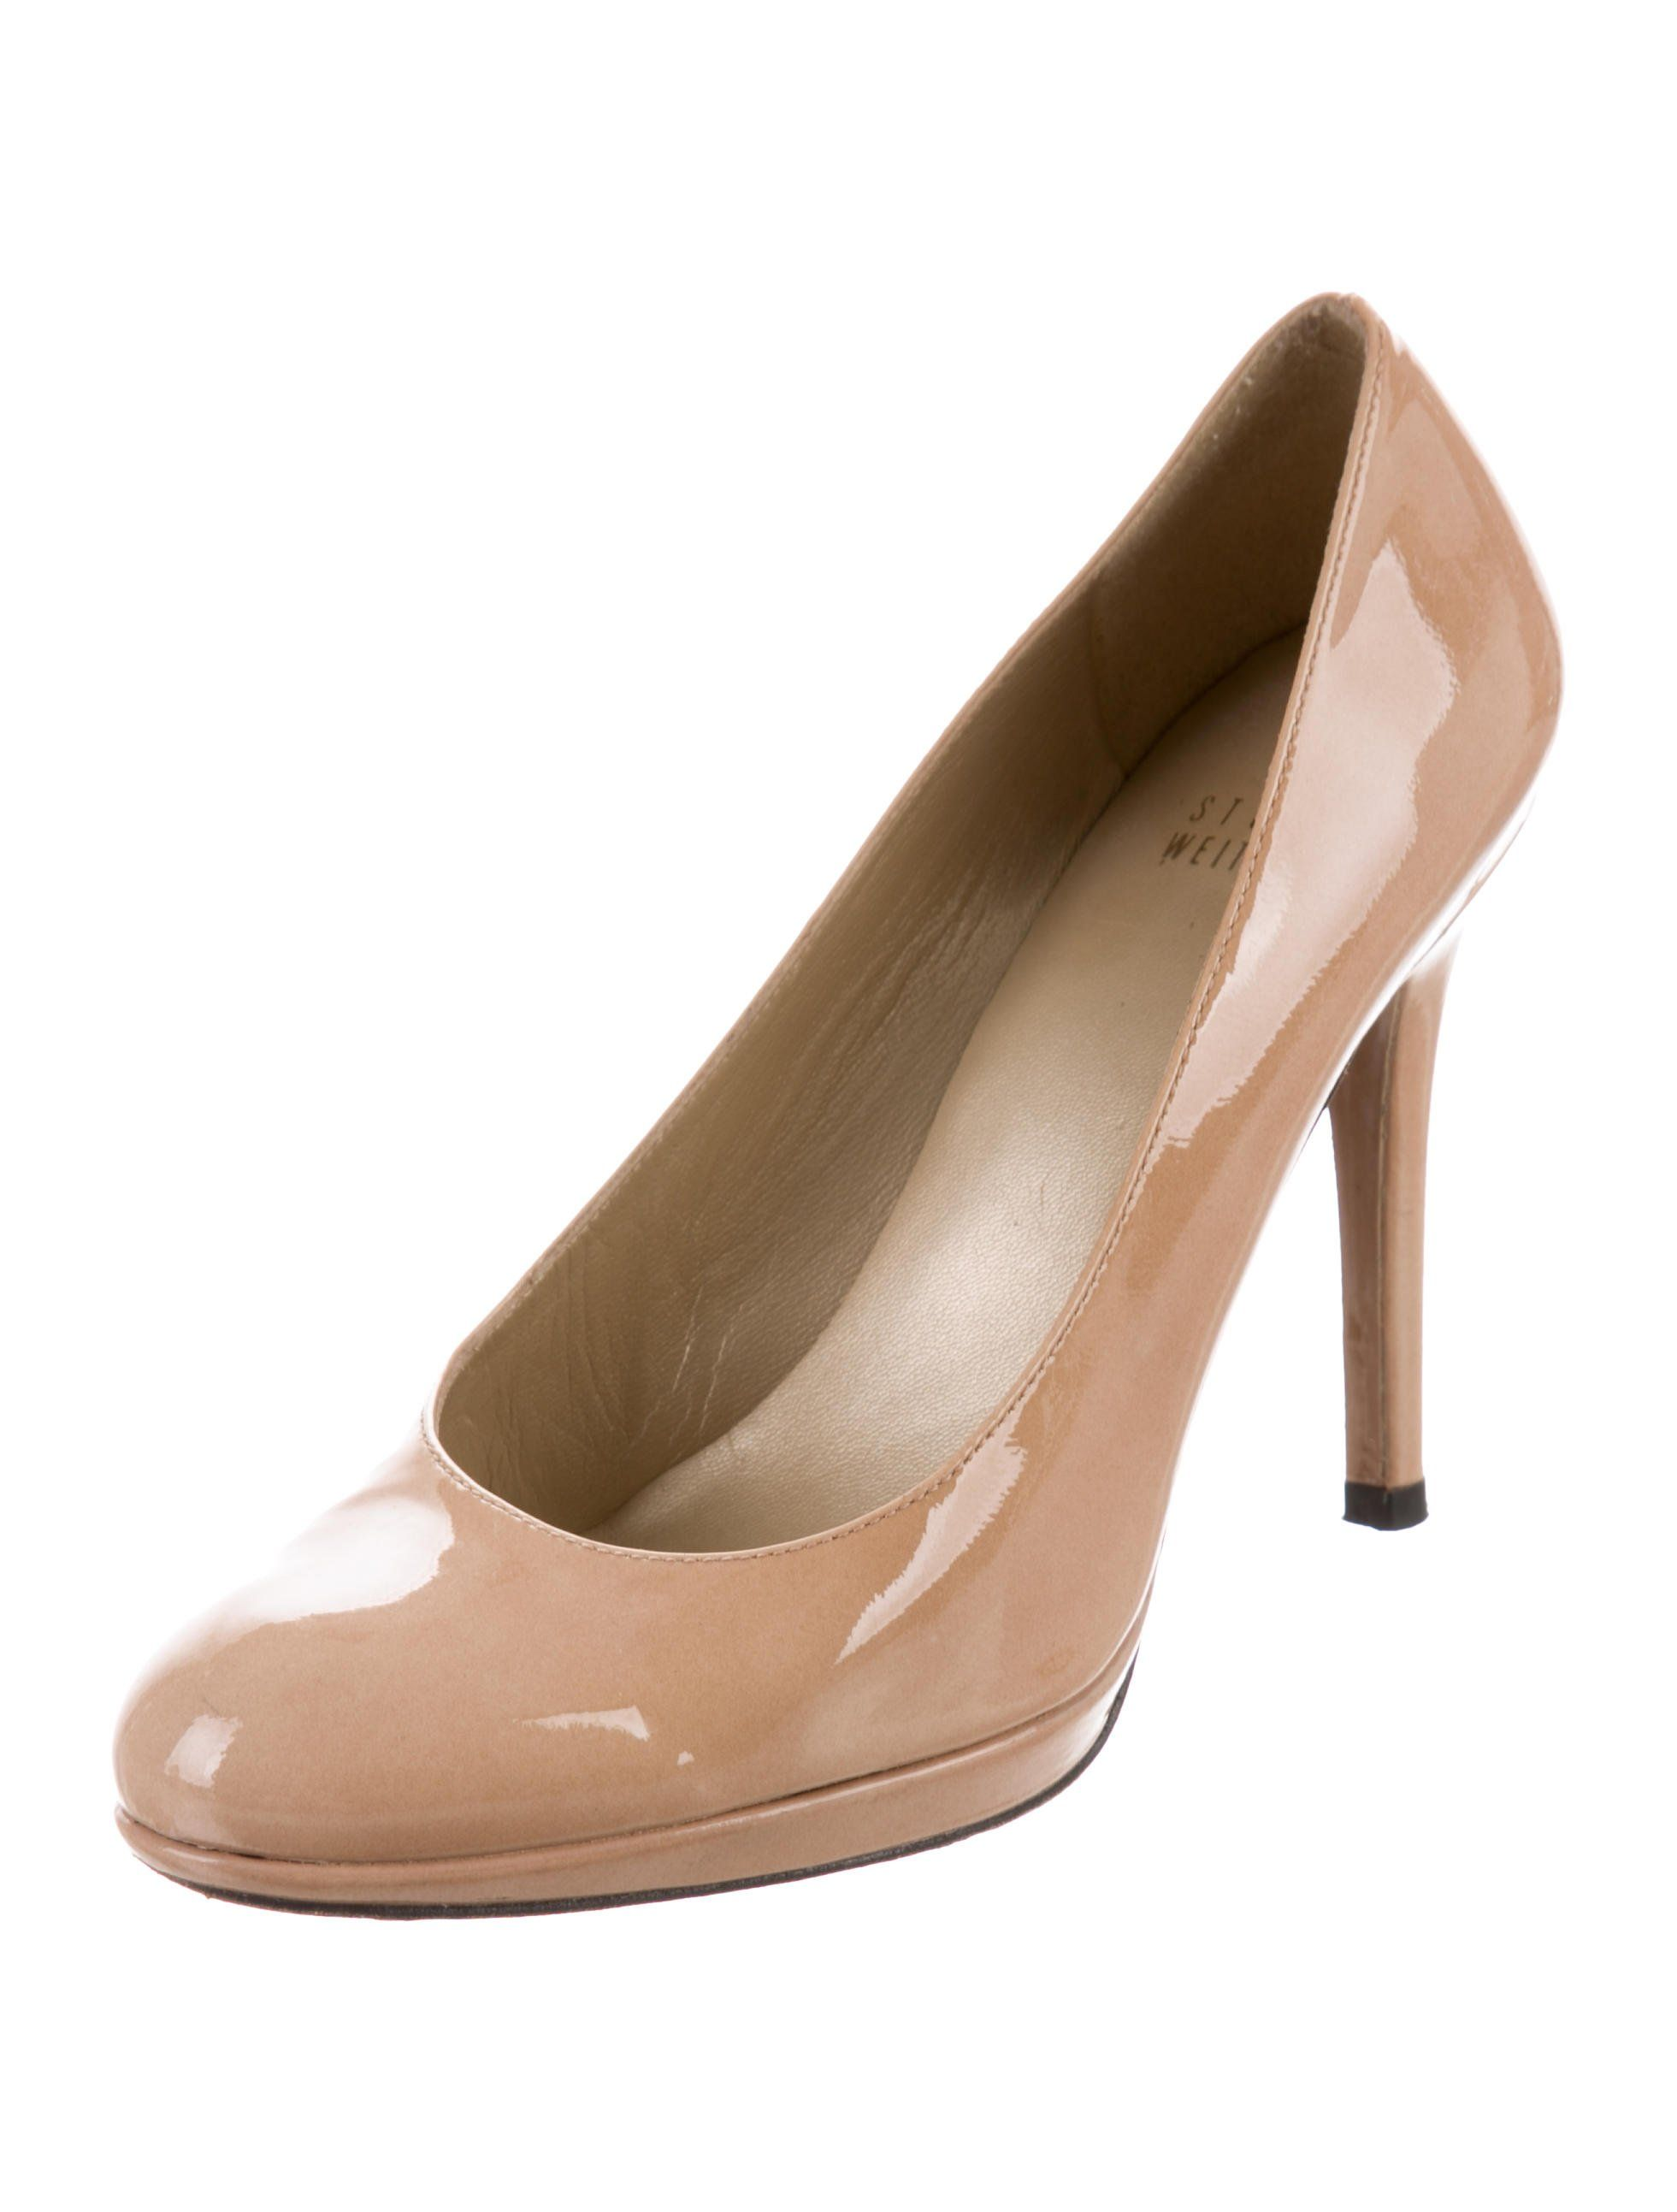 Naturalizer Womens Amie Nude Patent Peep Toe Heels Size 8